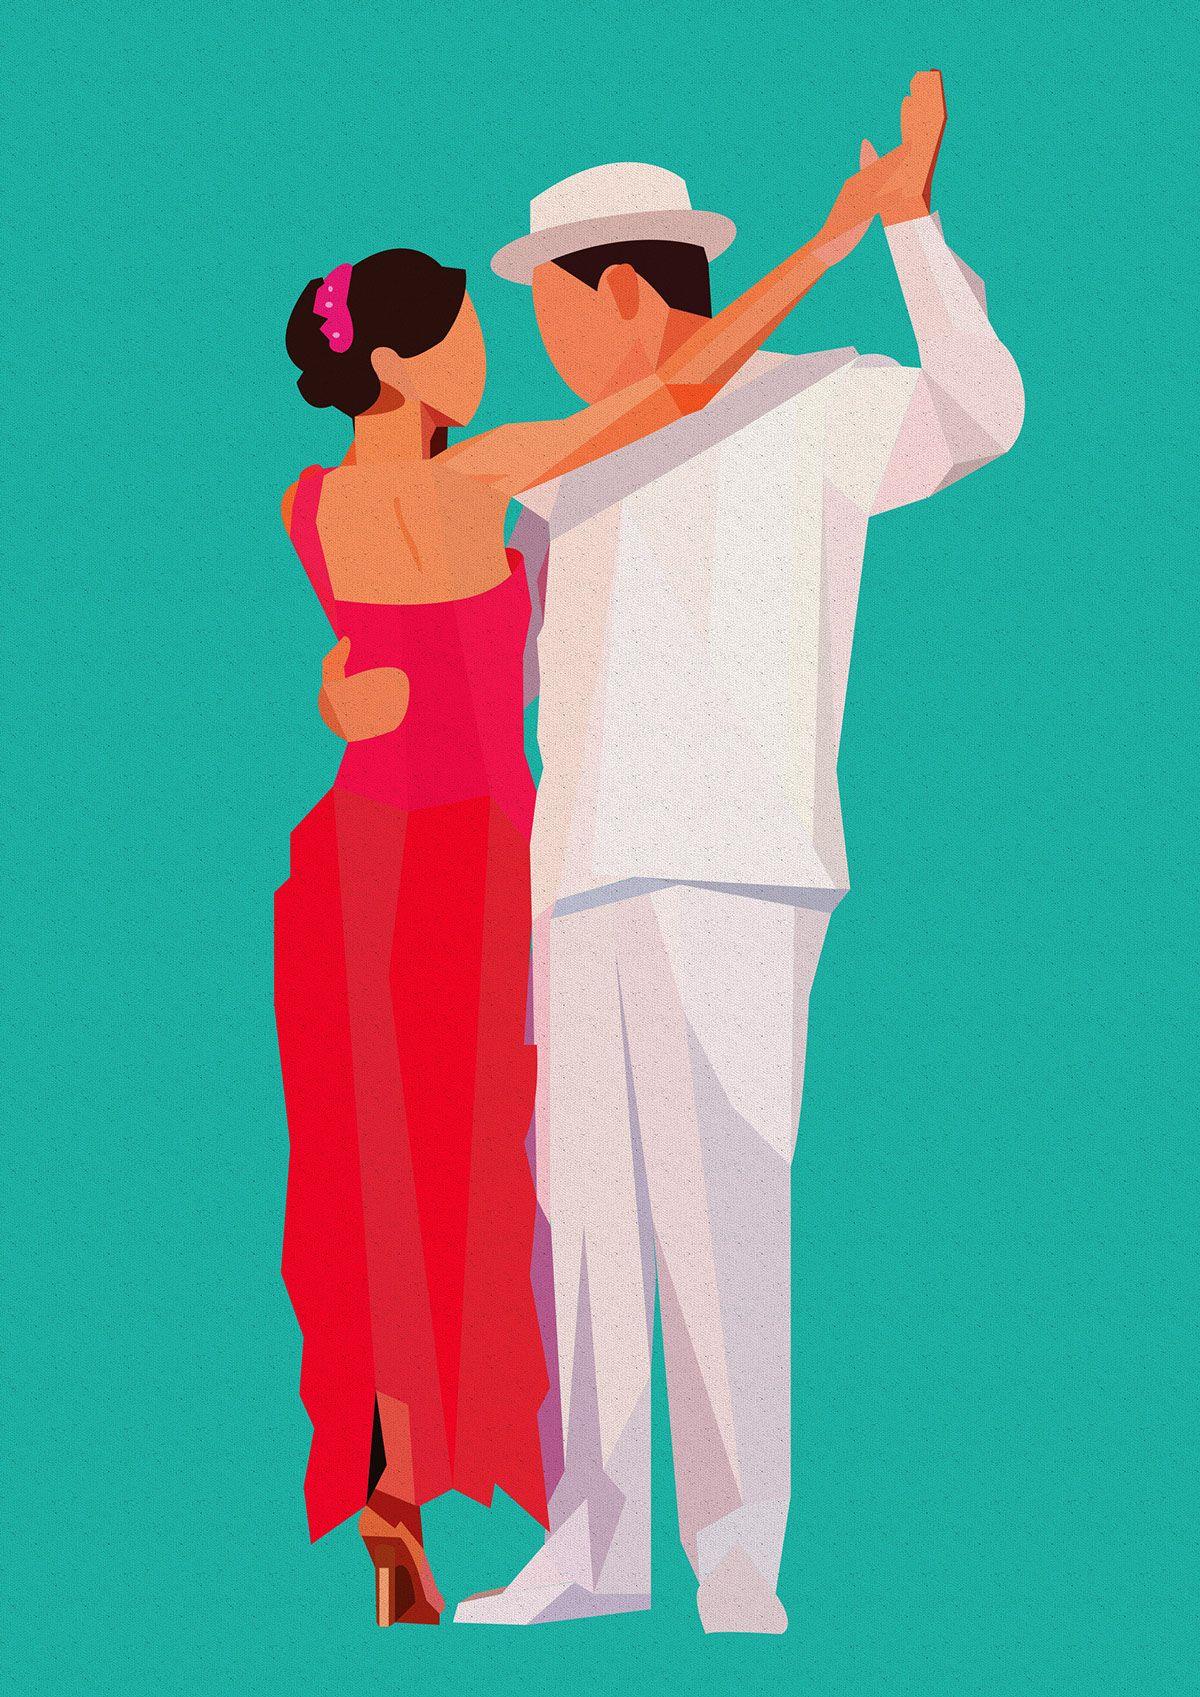 Baile serie I on Behance